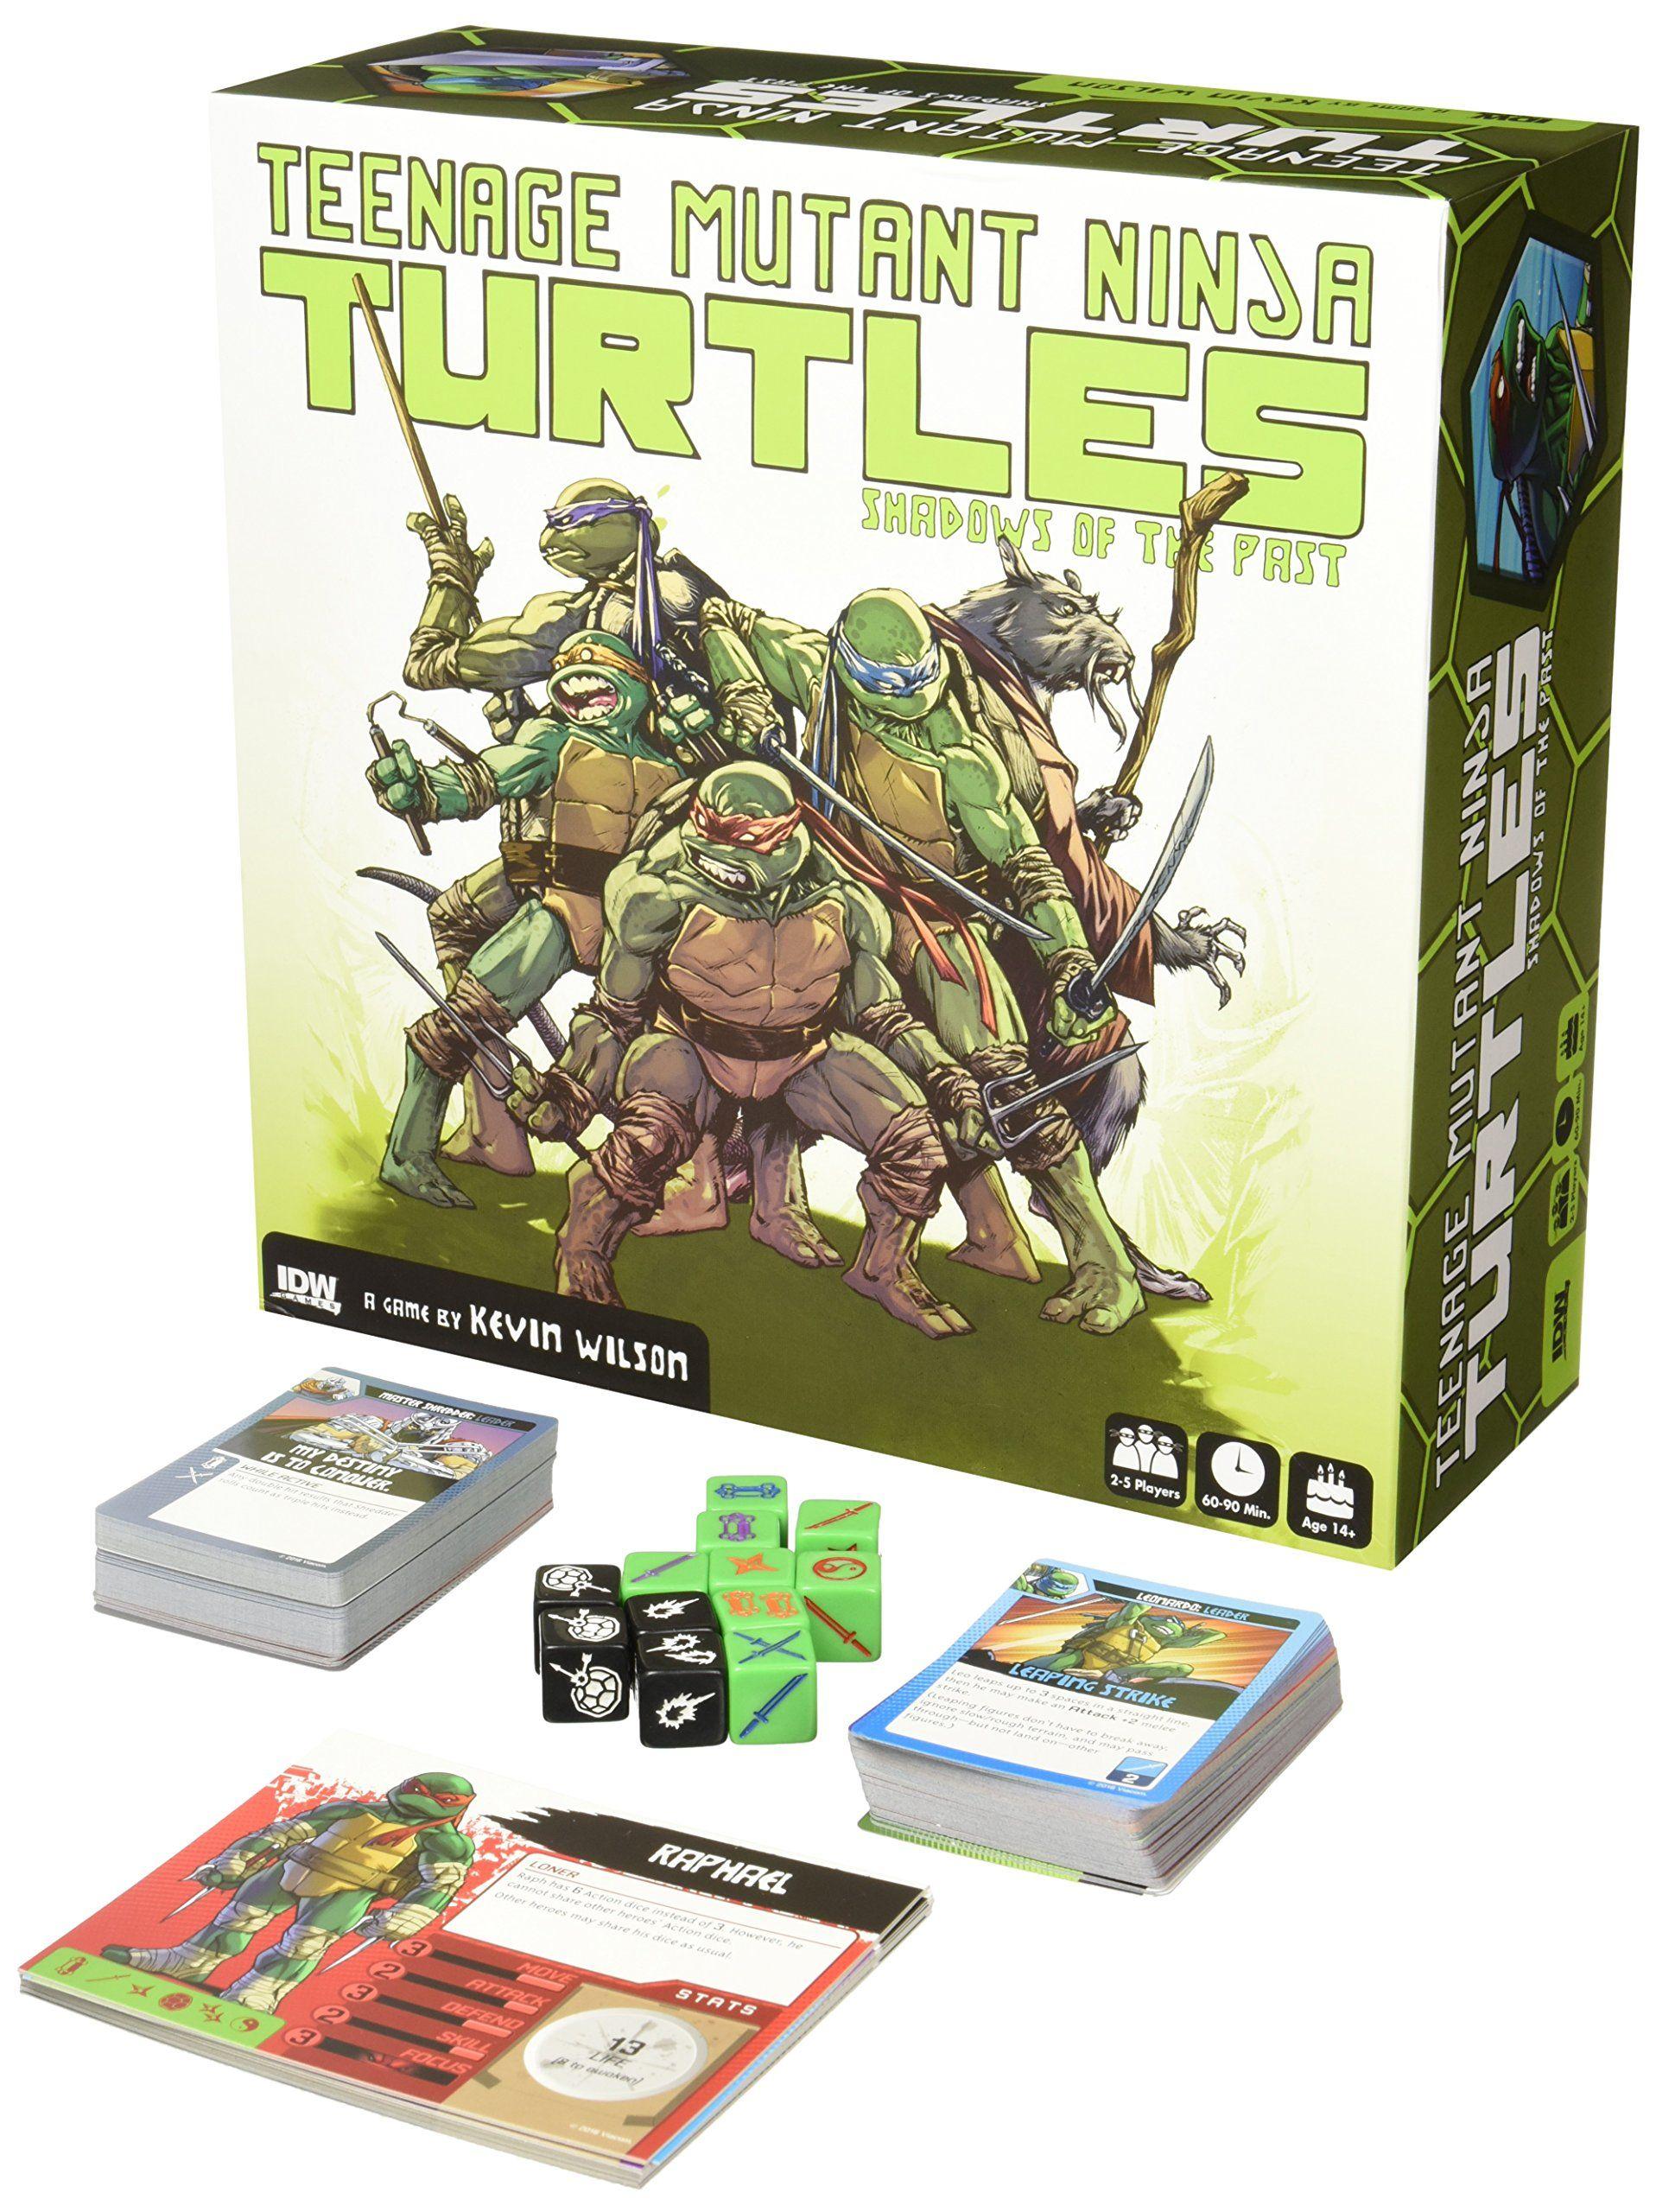 Idw games teenage mutant ninja turtles shadows of the